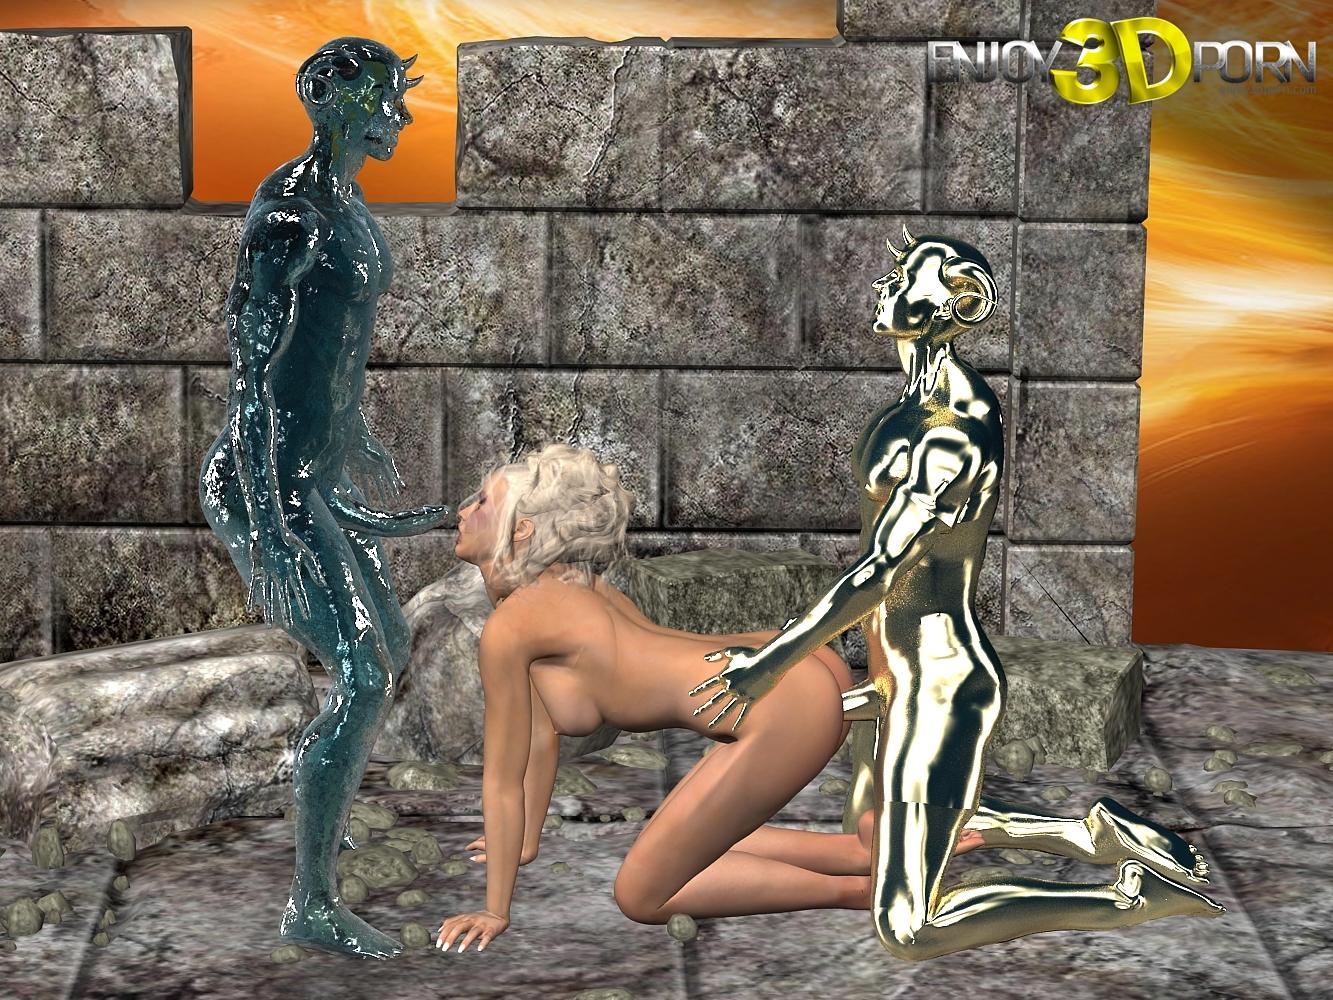 Fallout 3 creature sex porn movie